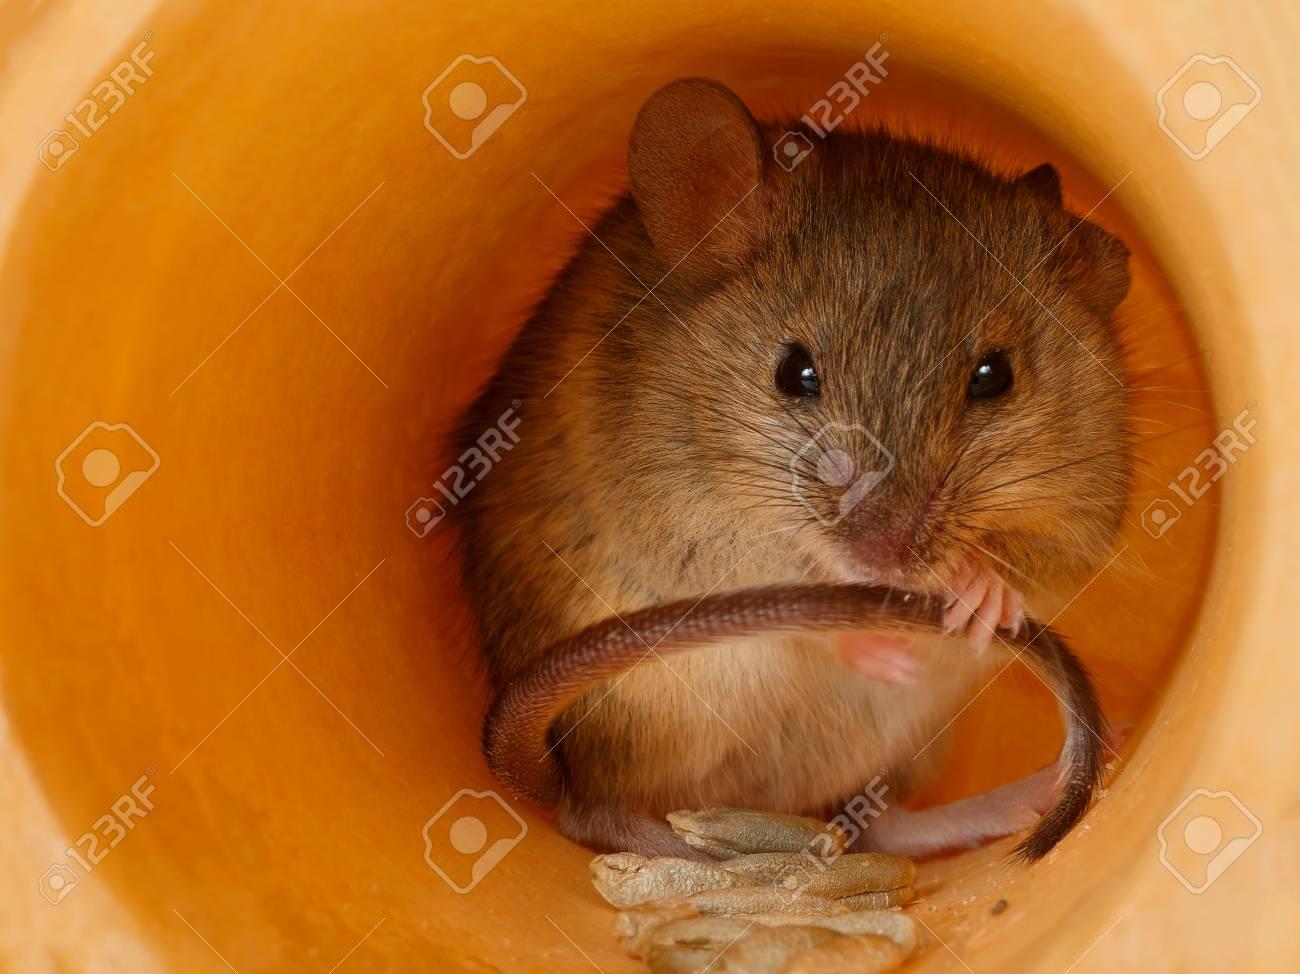 closeup mouse Standard-Bild - 93001722